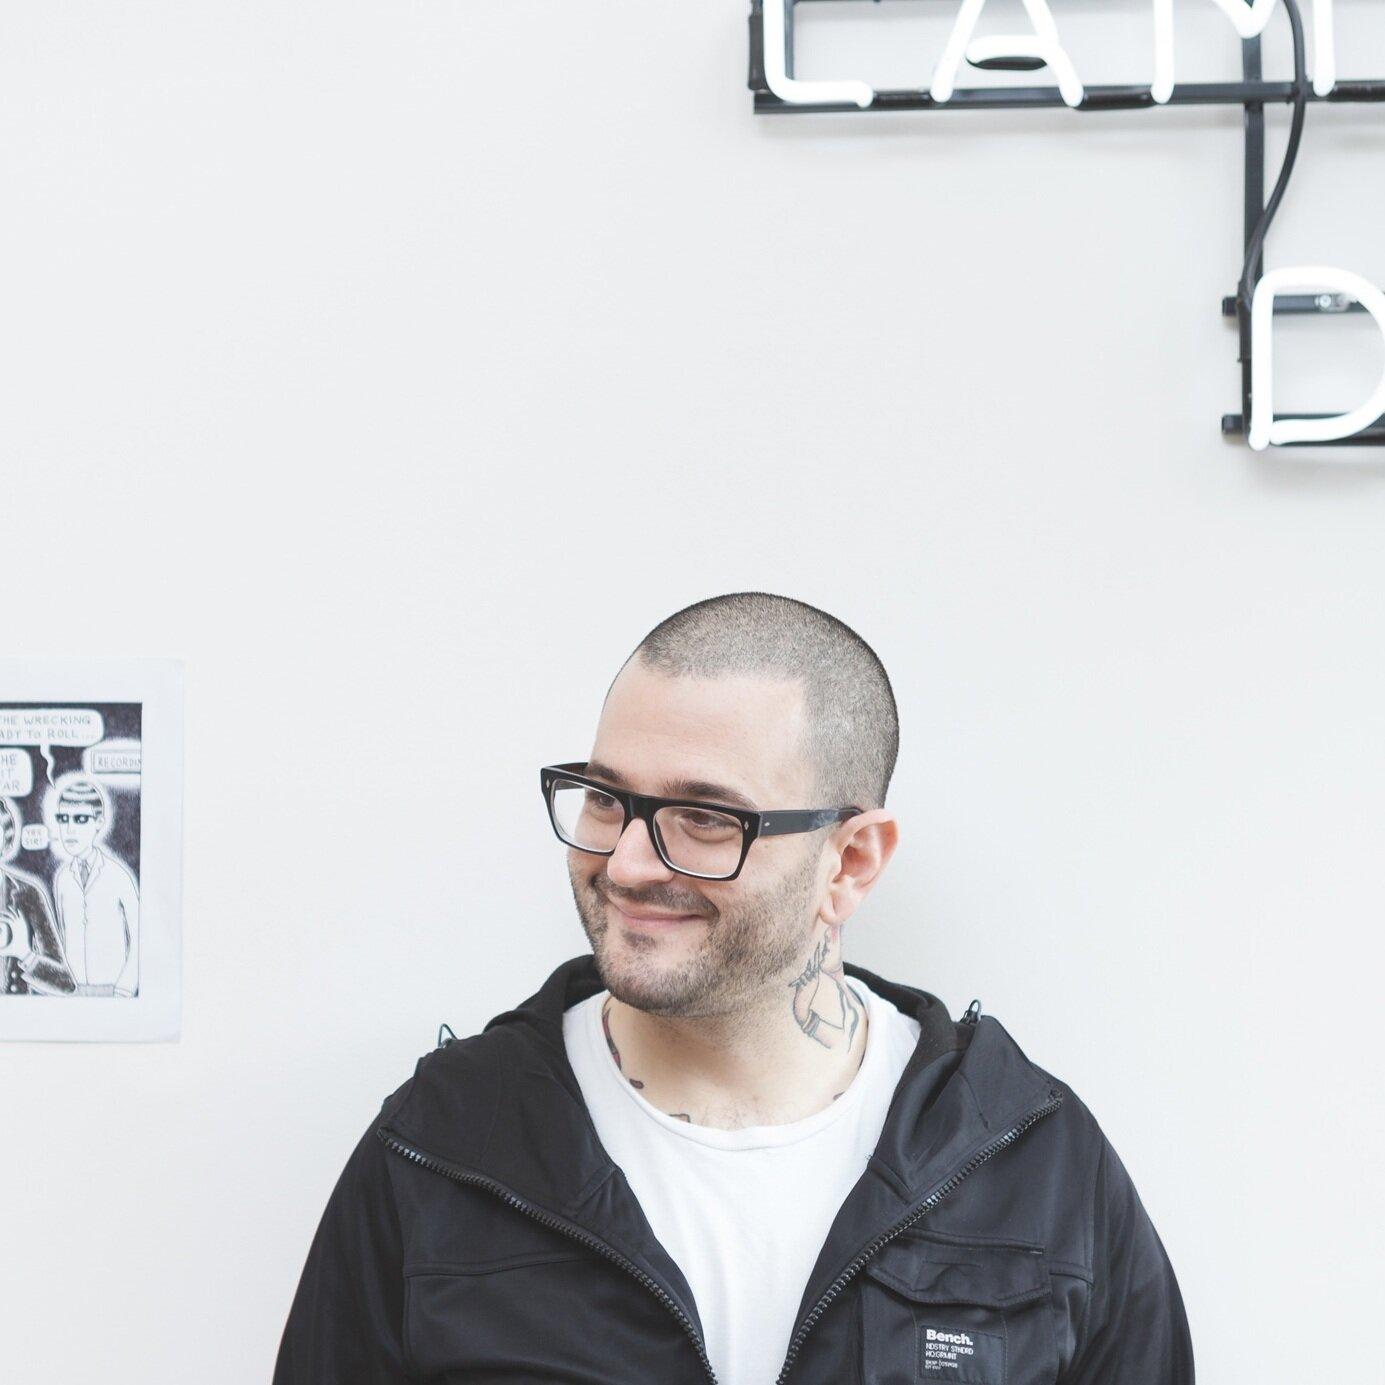 Jeremy+Wortsman+interview+Extraordinary+Routines